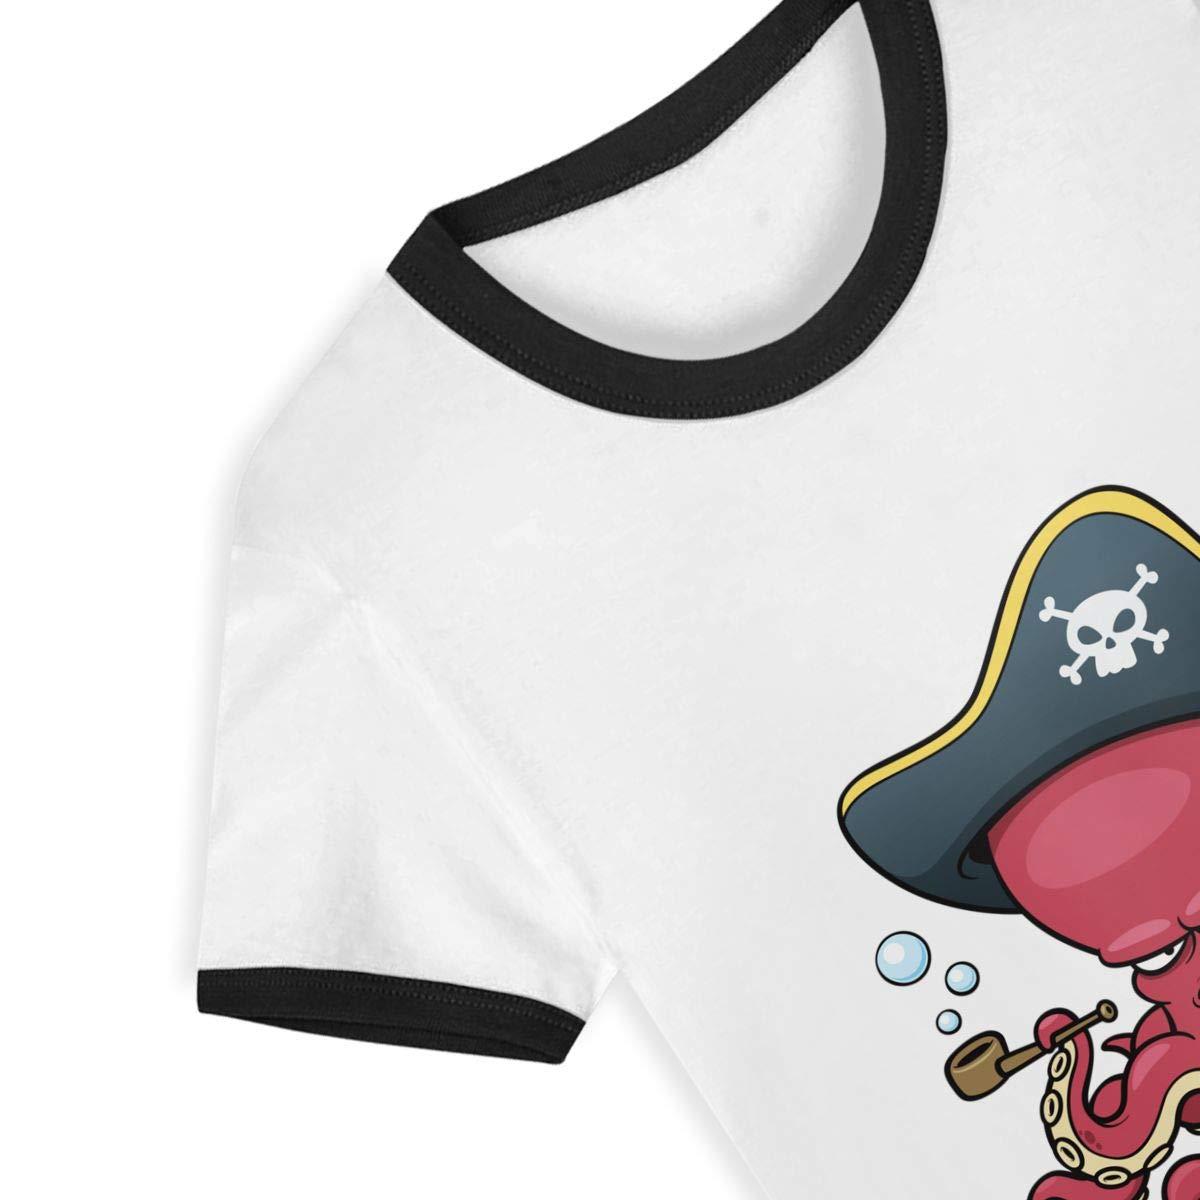 Gomop Cartoon Octopus Pirate Summer Basic Tees-Youth Short Sleeve Tee Short T Shirts